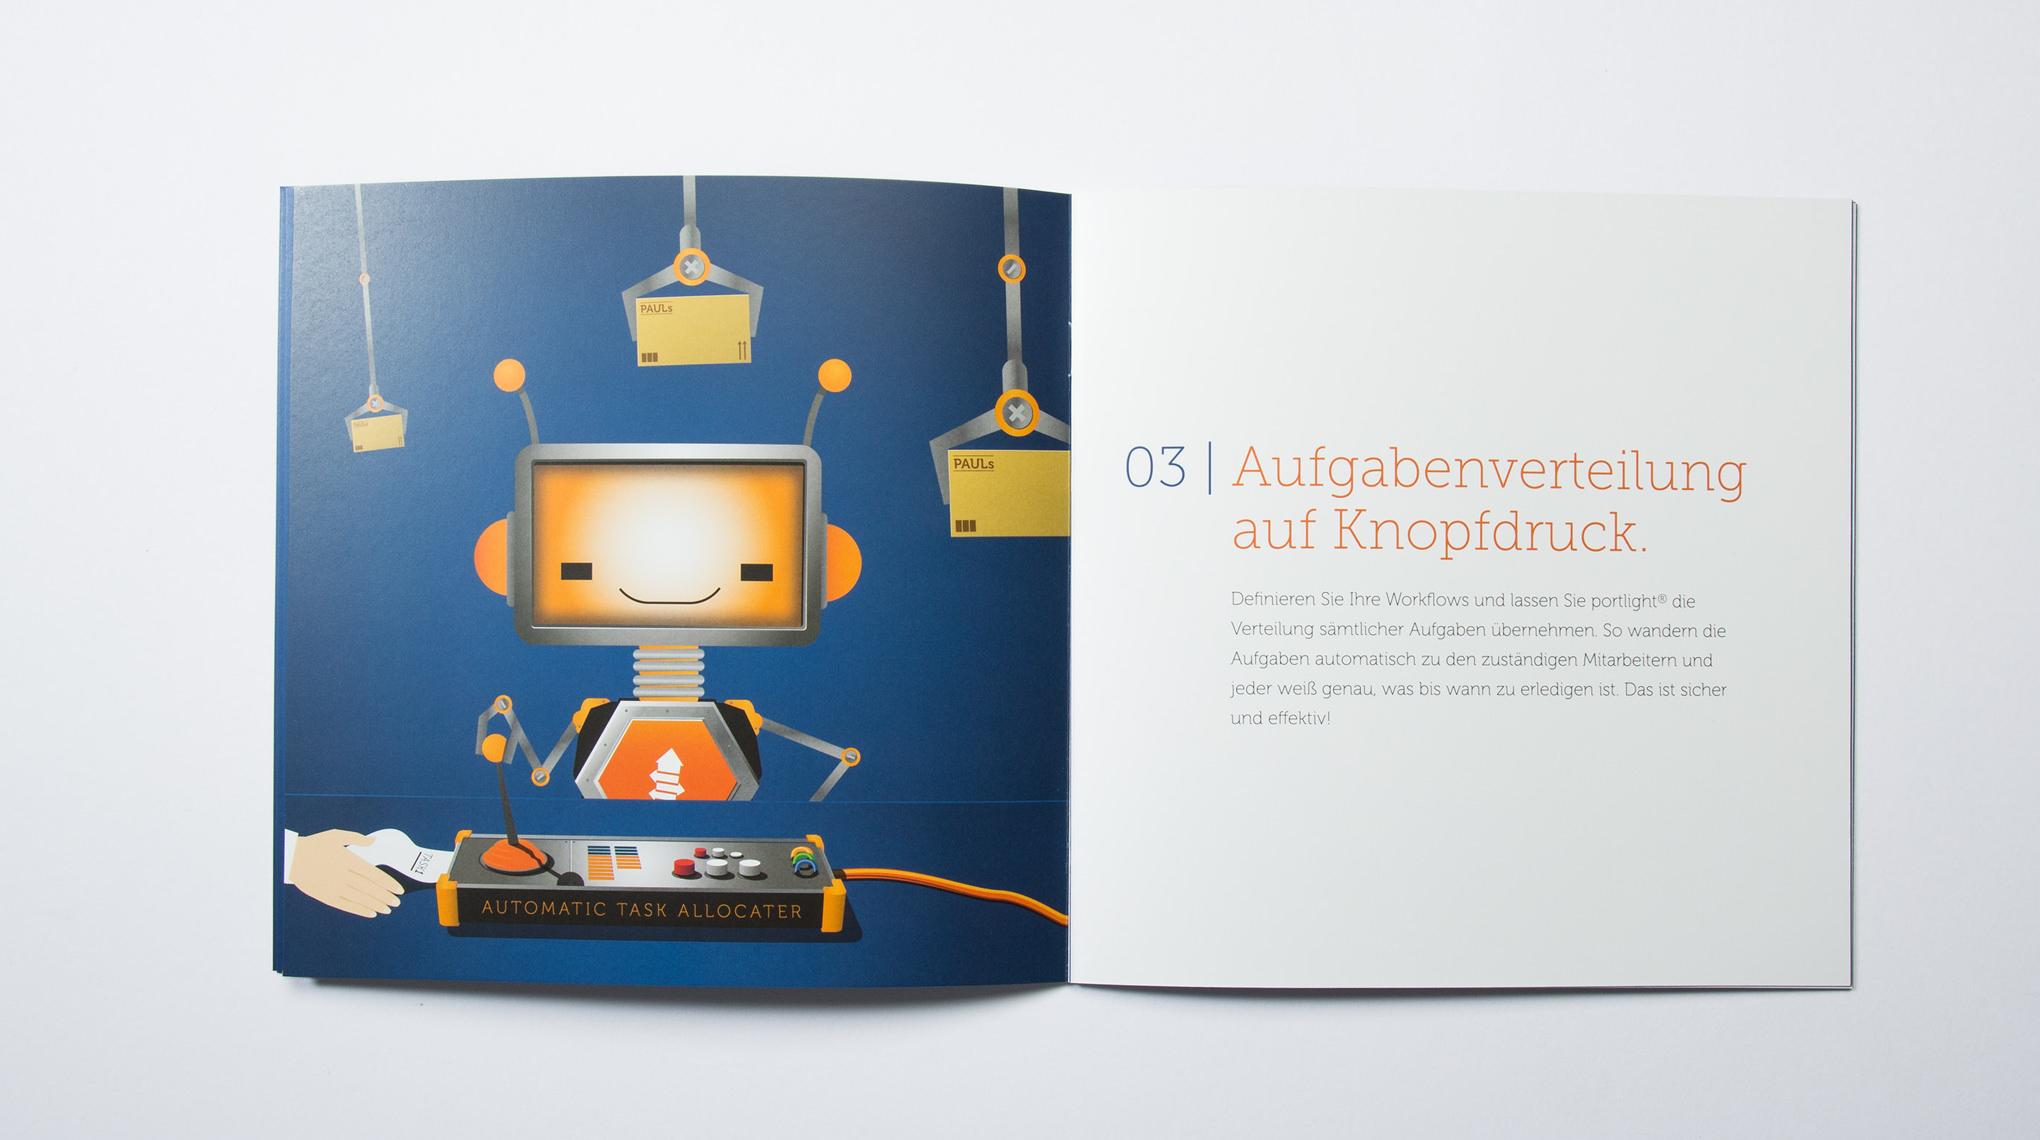 soi_portlight_08.4.jpg